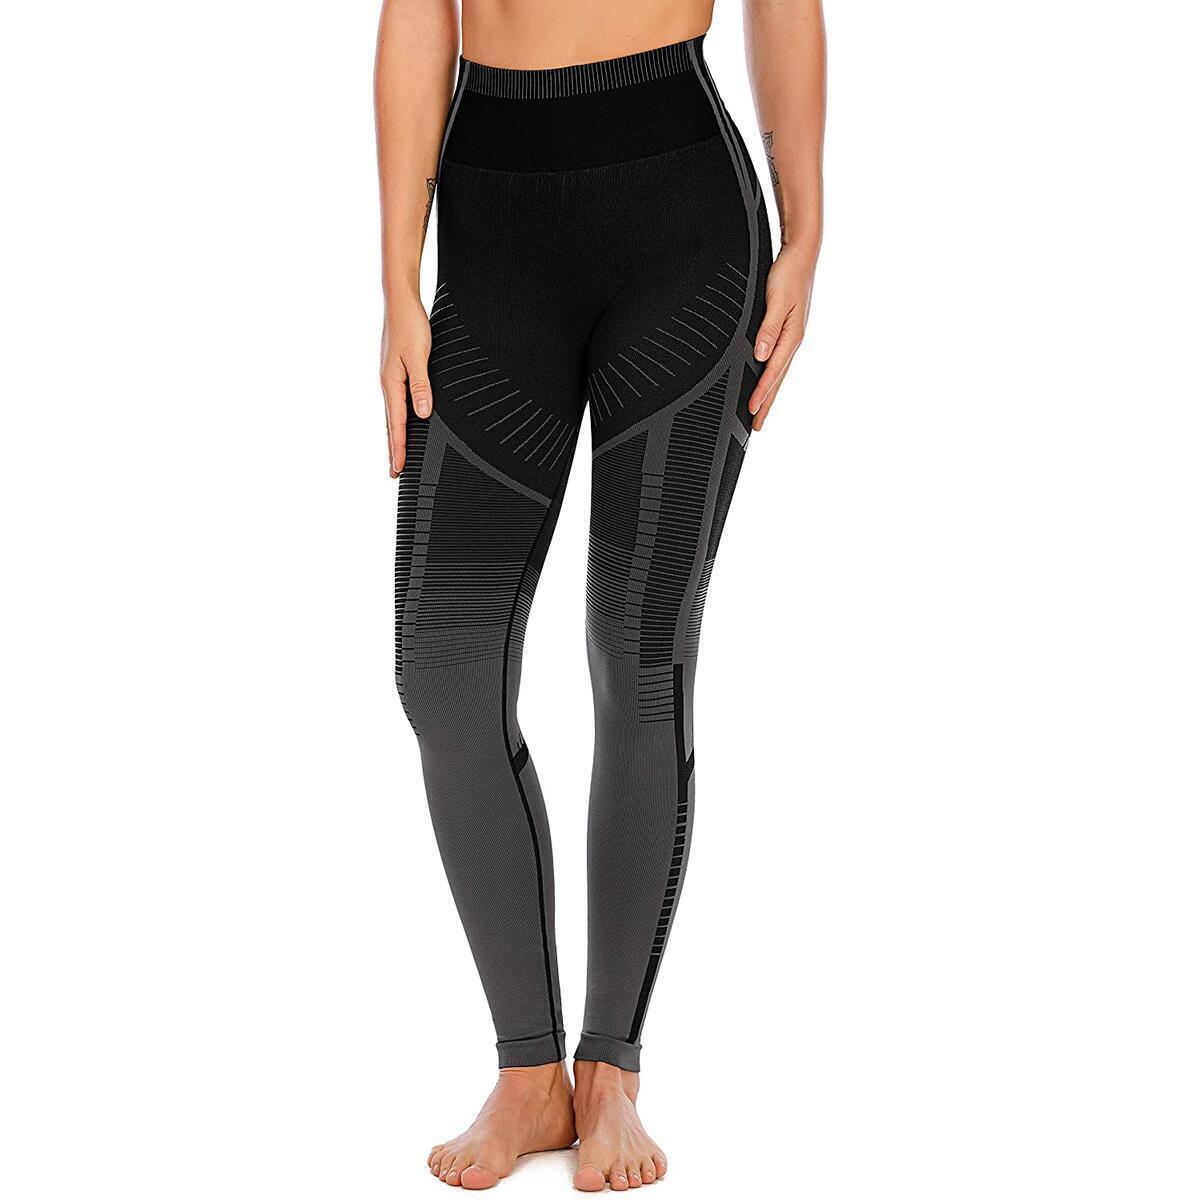 RUNNING GIRL Ombre High Waist Yoga Leggings,Butt Lifting Yoga Pants Tummy Control Compression Gym Workout Leggings for Women(BLACK,M)